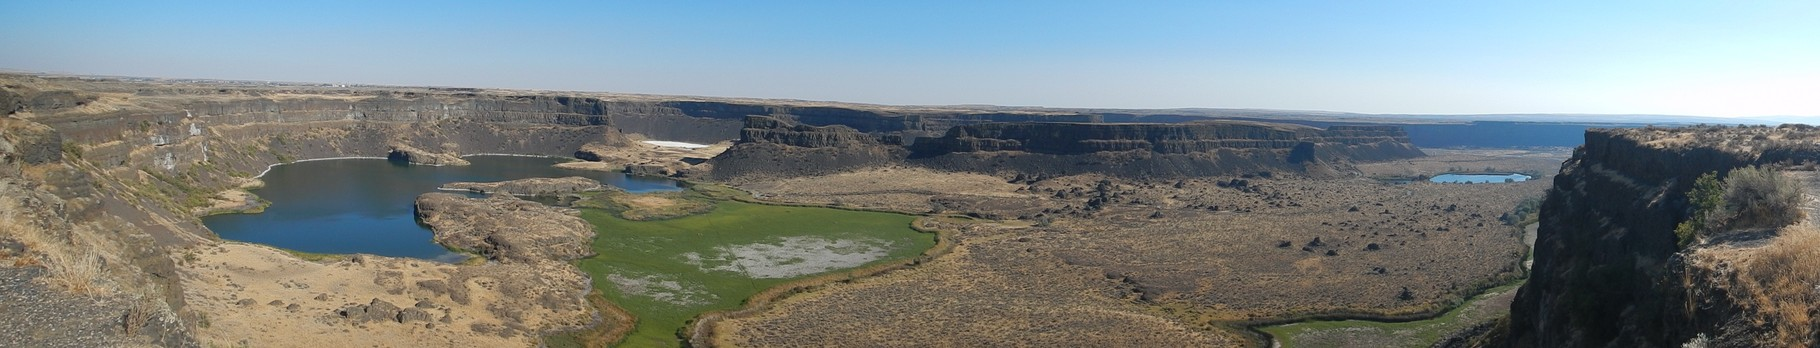 Dry falls WA